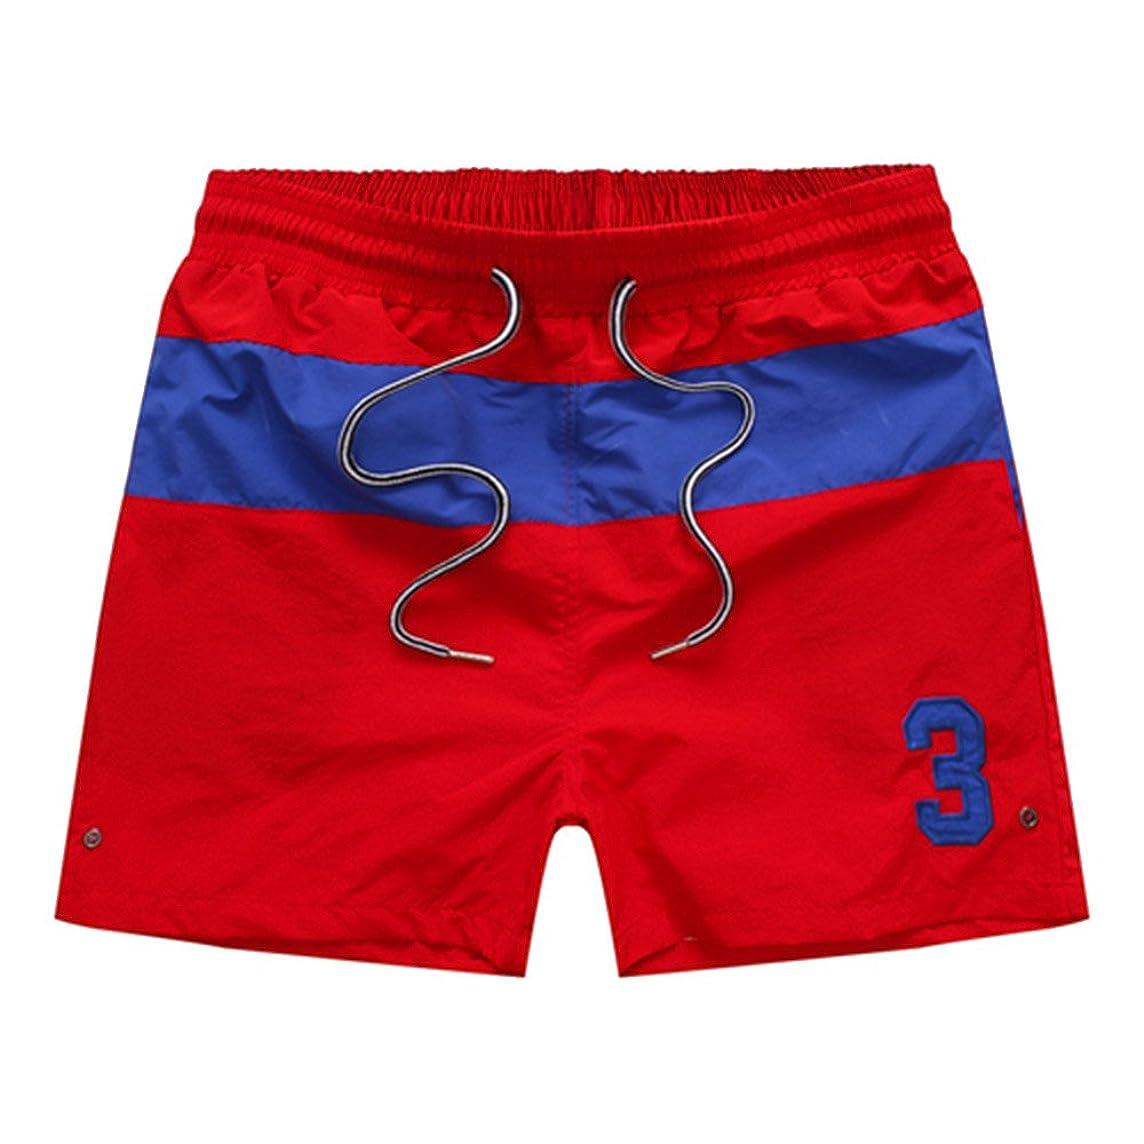 ZFADDS Summer Men's Board Shorts Summer Swimwear Male Beach Pants Trunks Brand Clothing